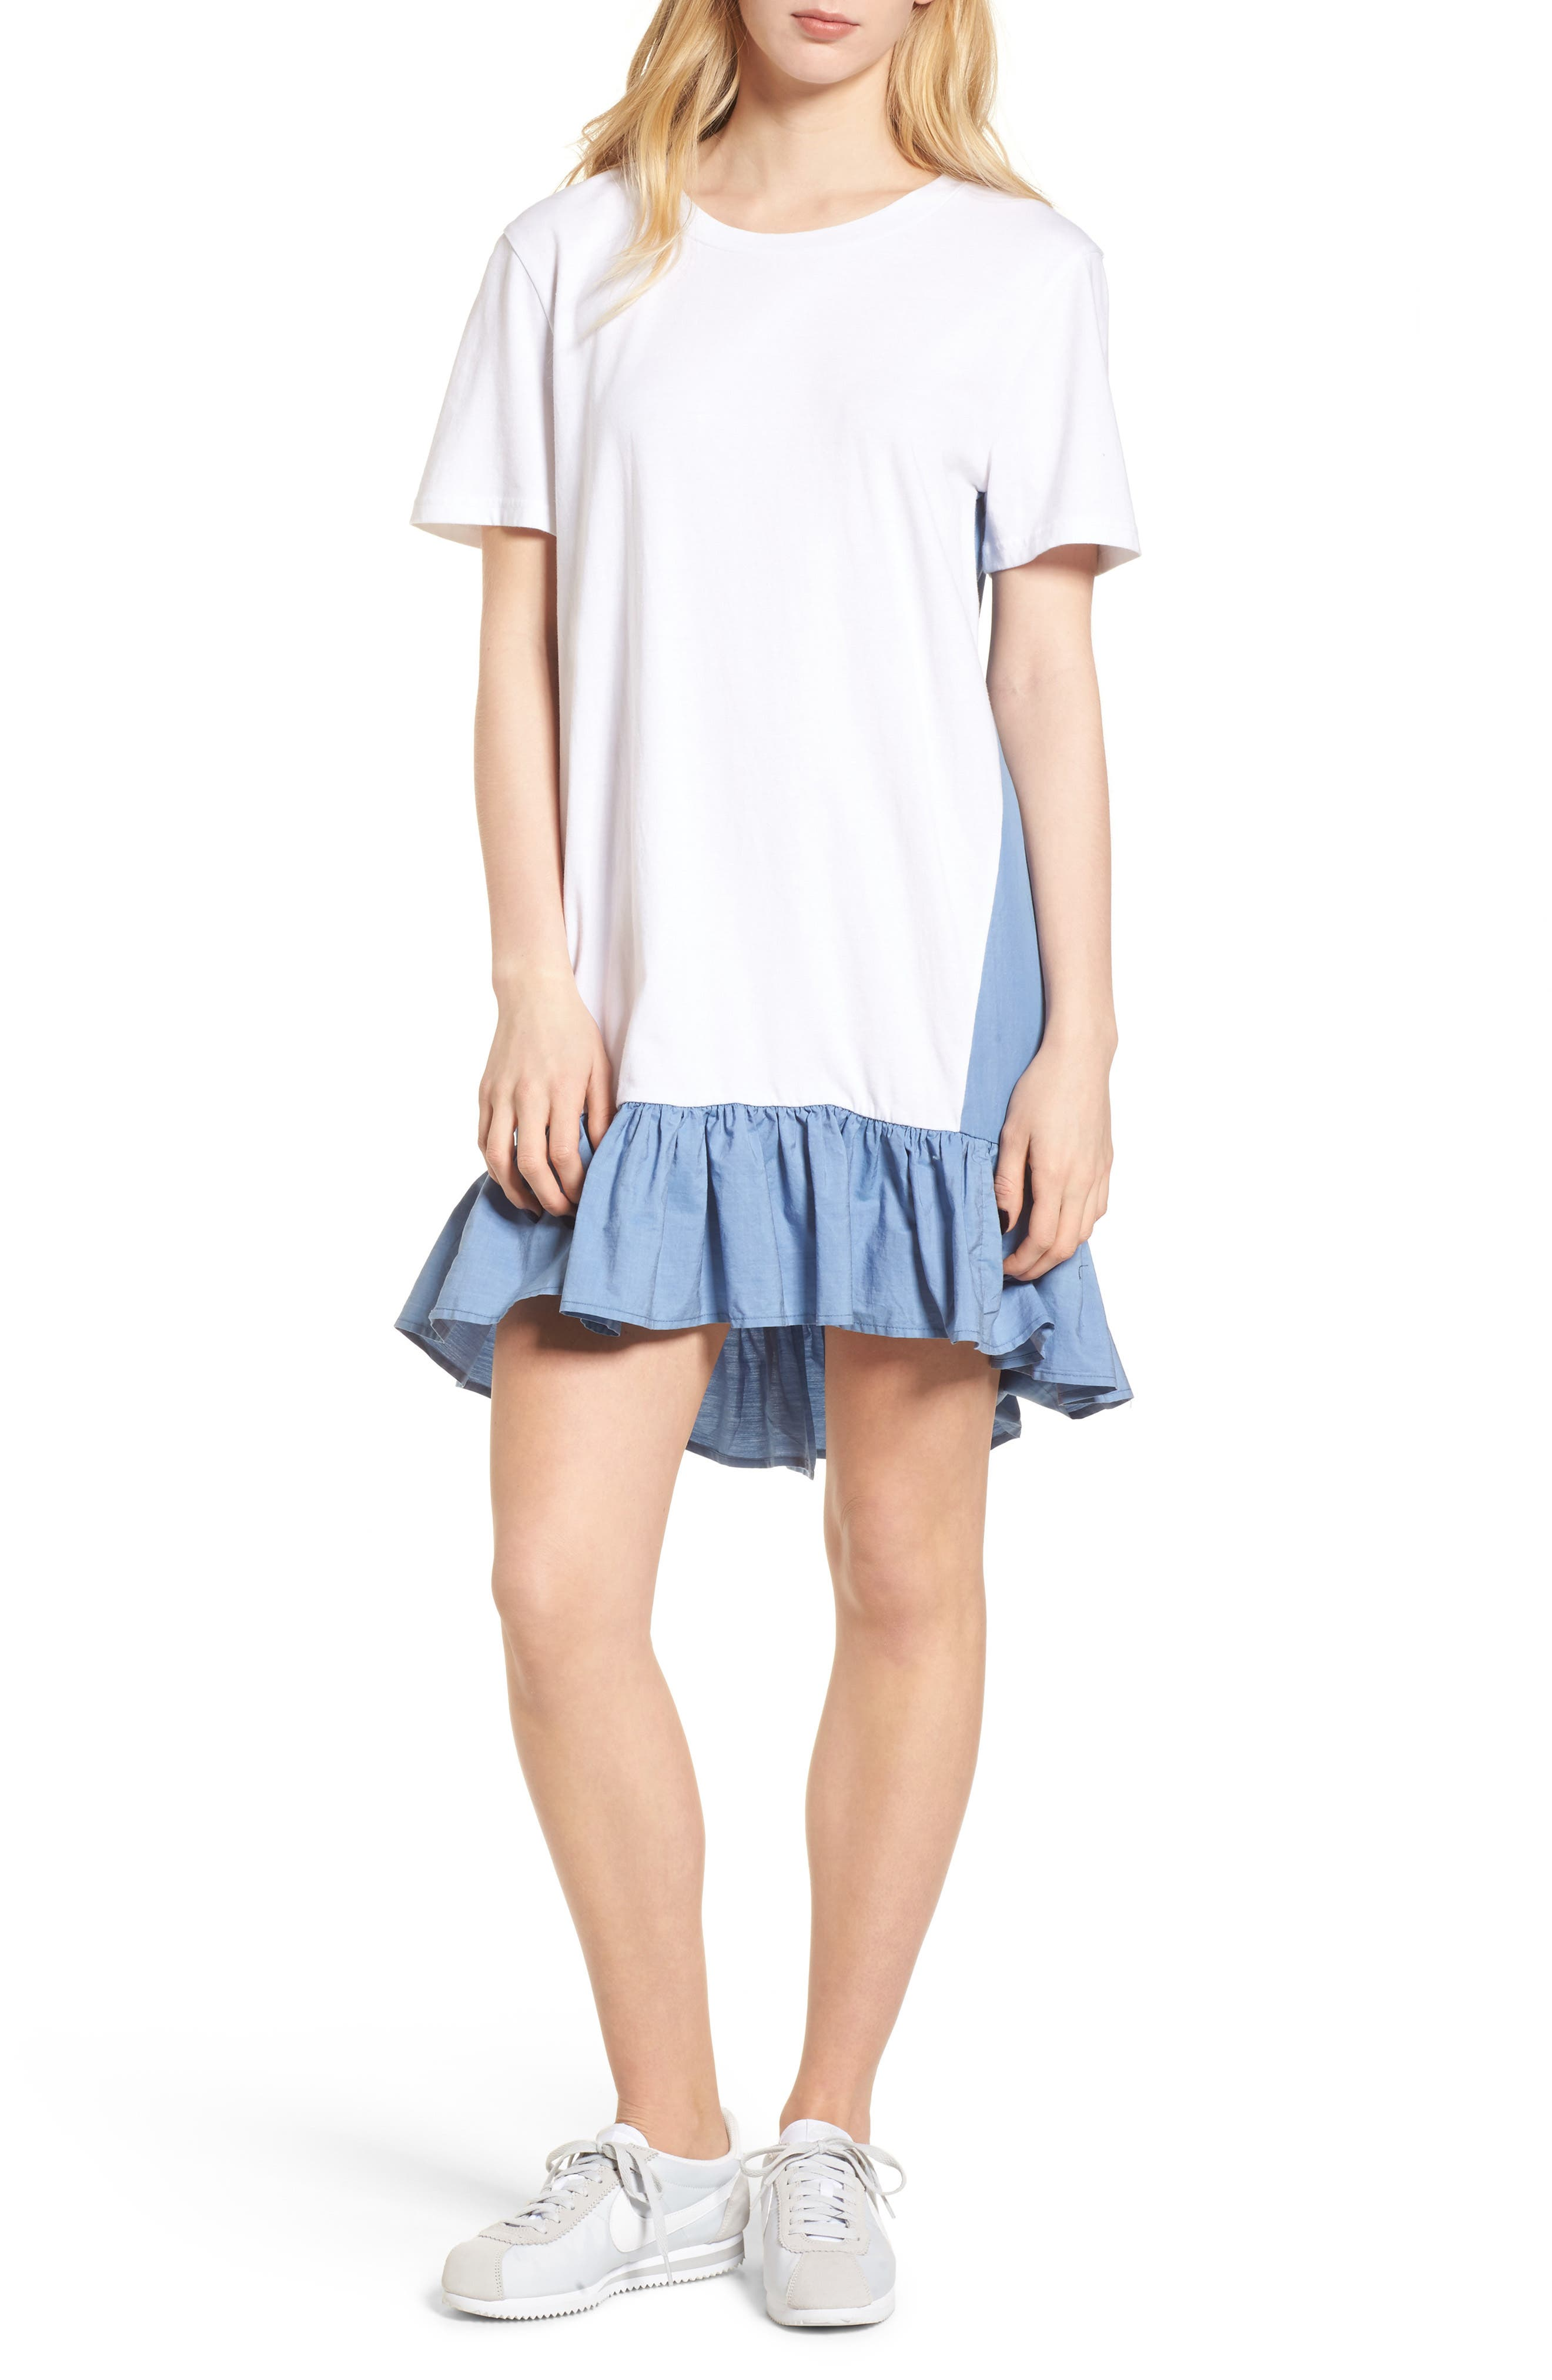 Main Image - BP. Mixed Media T-Shirt Dress